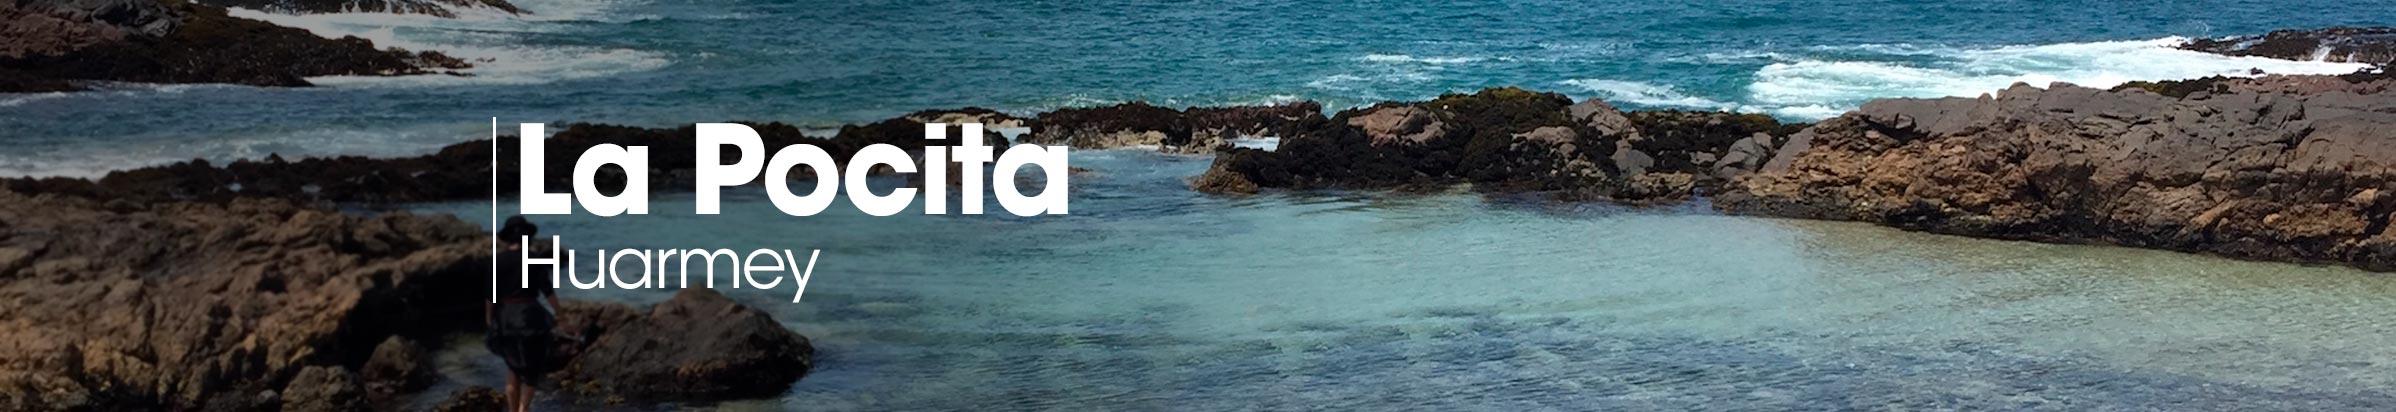 Blog-Img-PlayasPerú-LaPocita